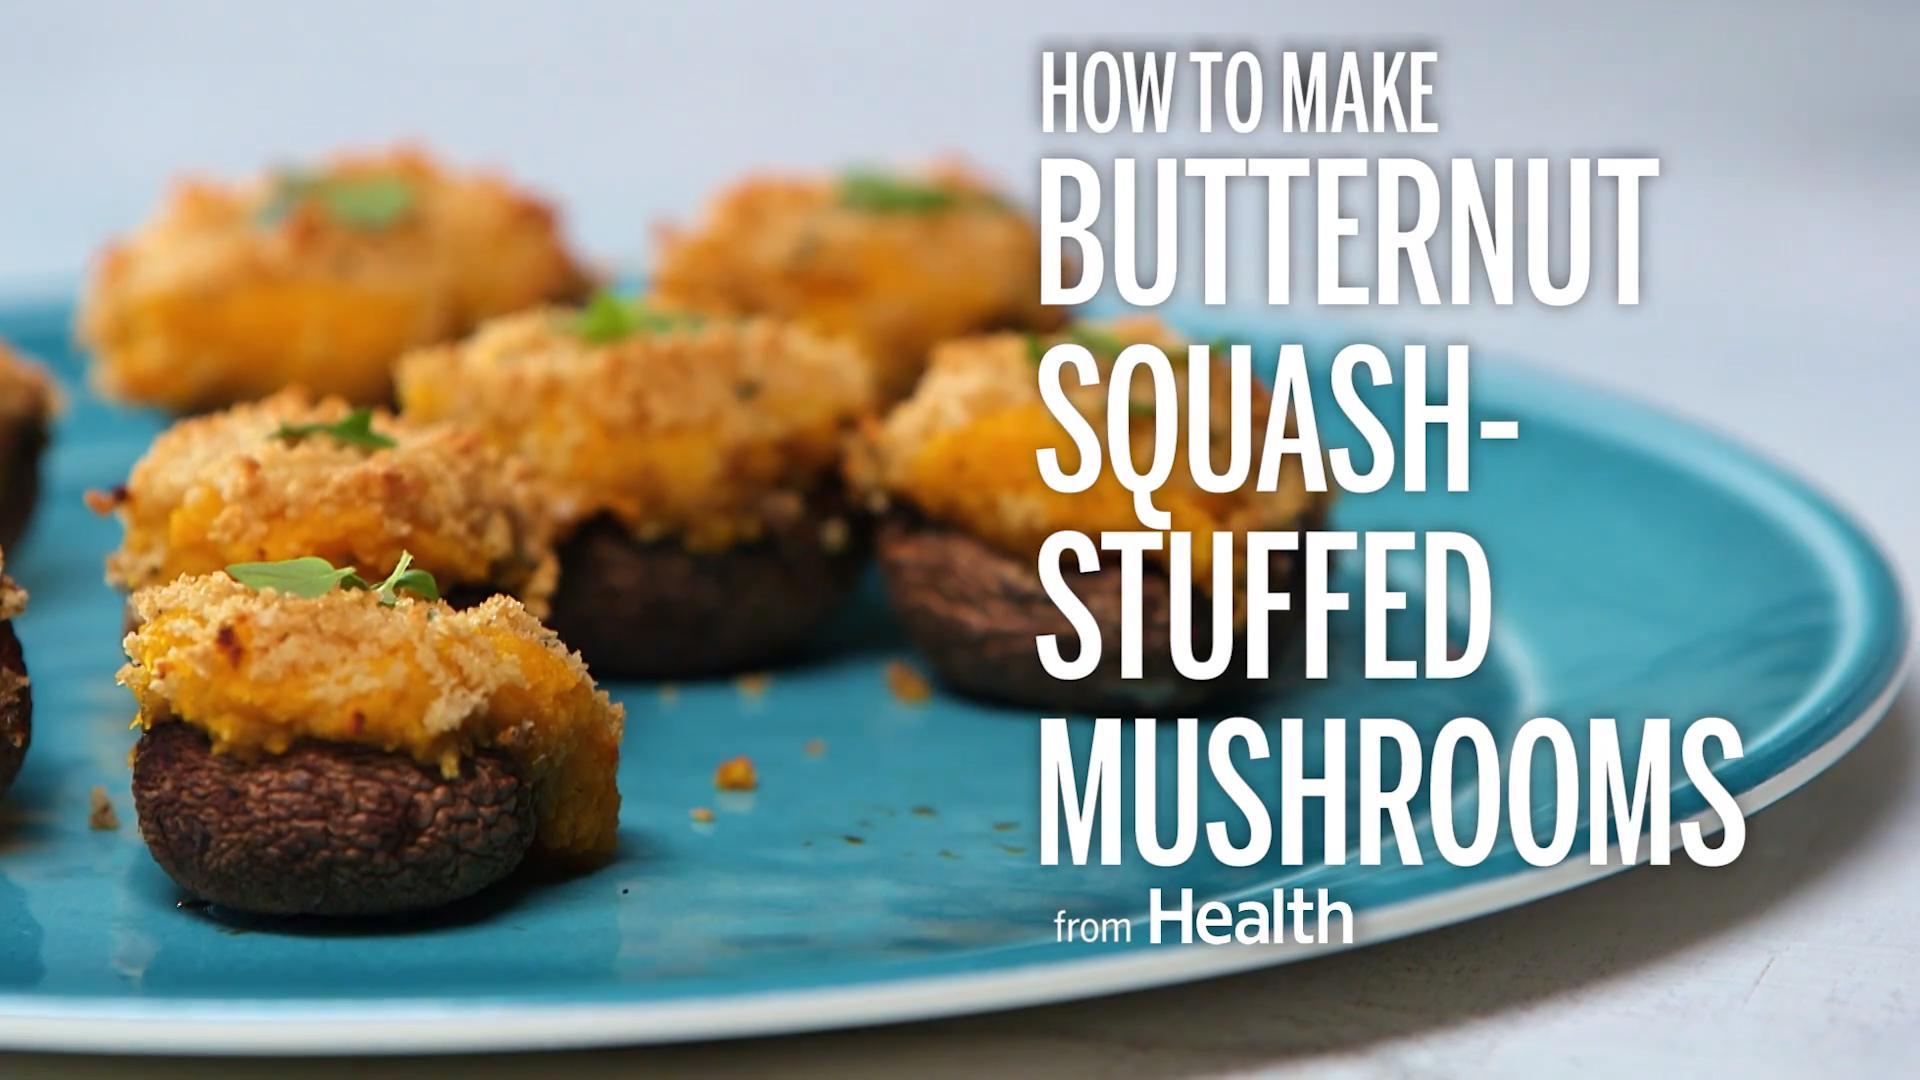 Creamy Butternut Squash-Stuffed Mushrooms